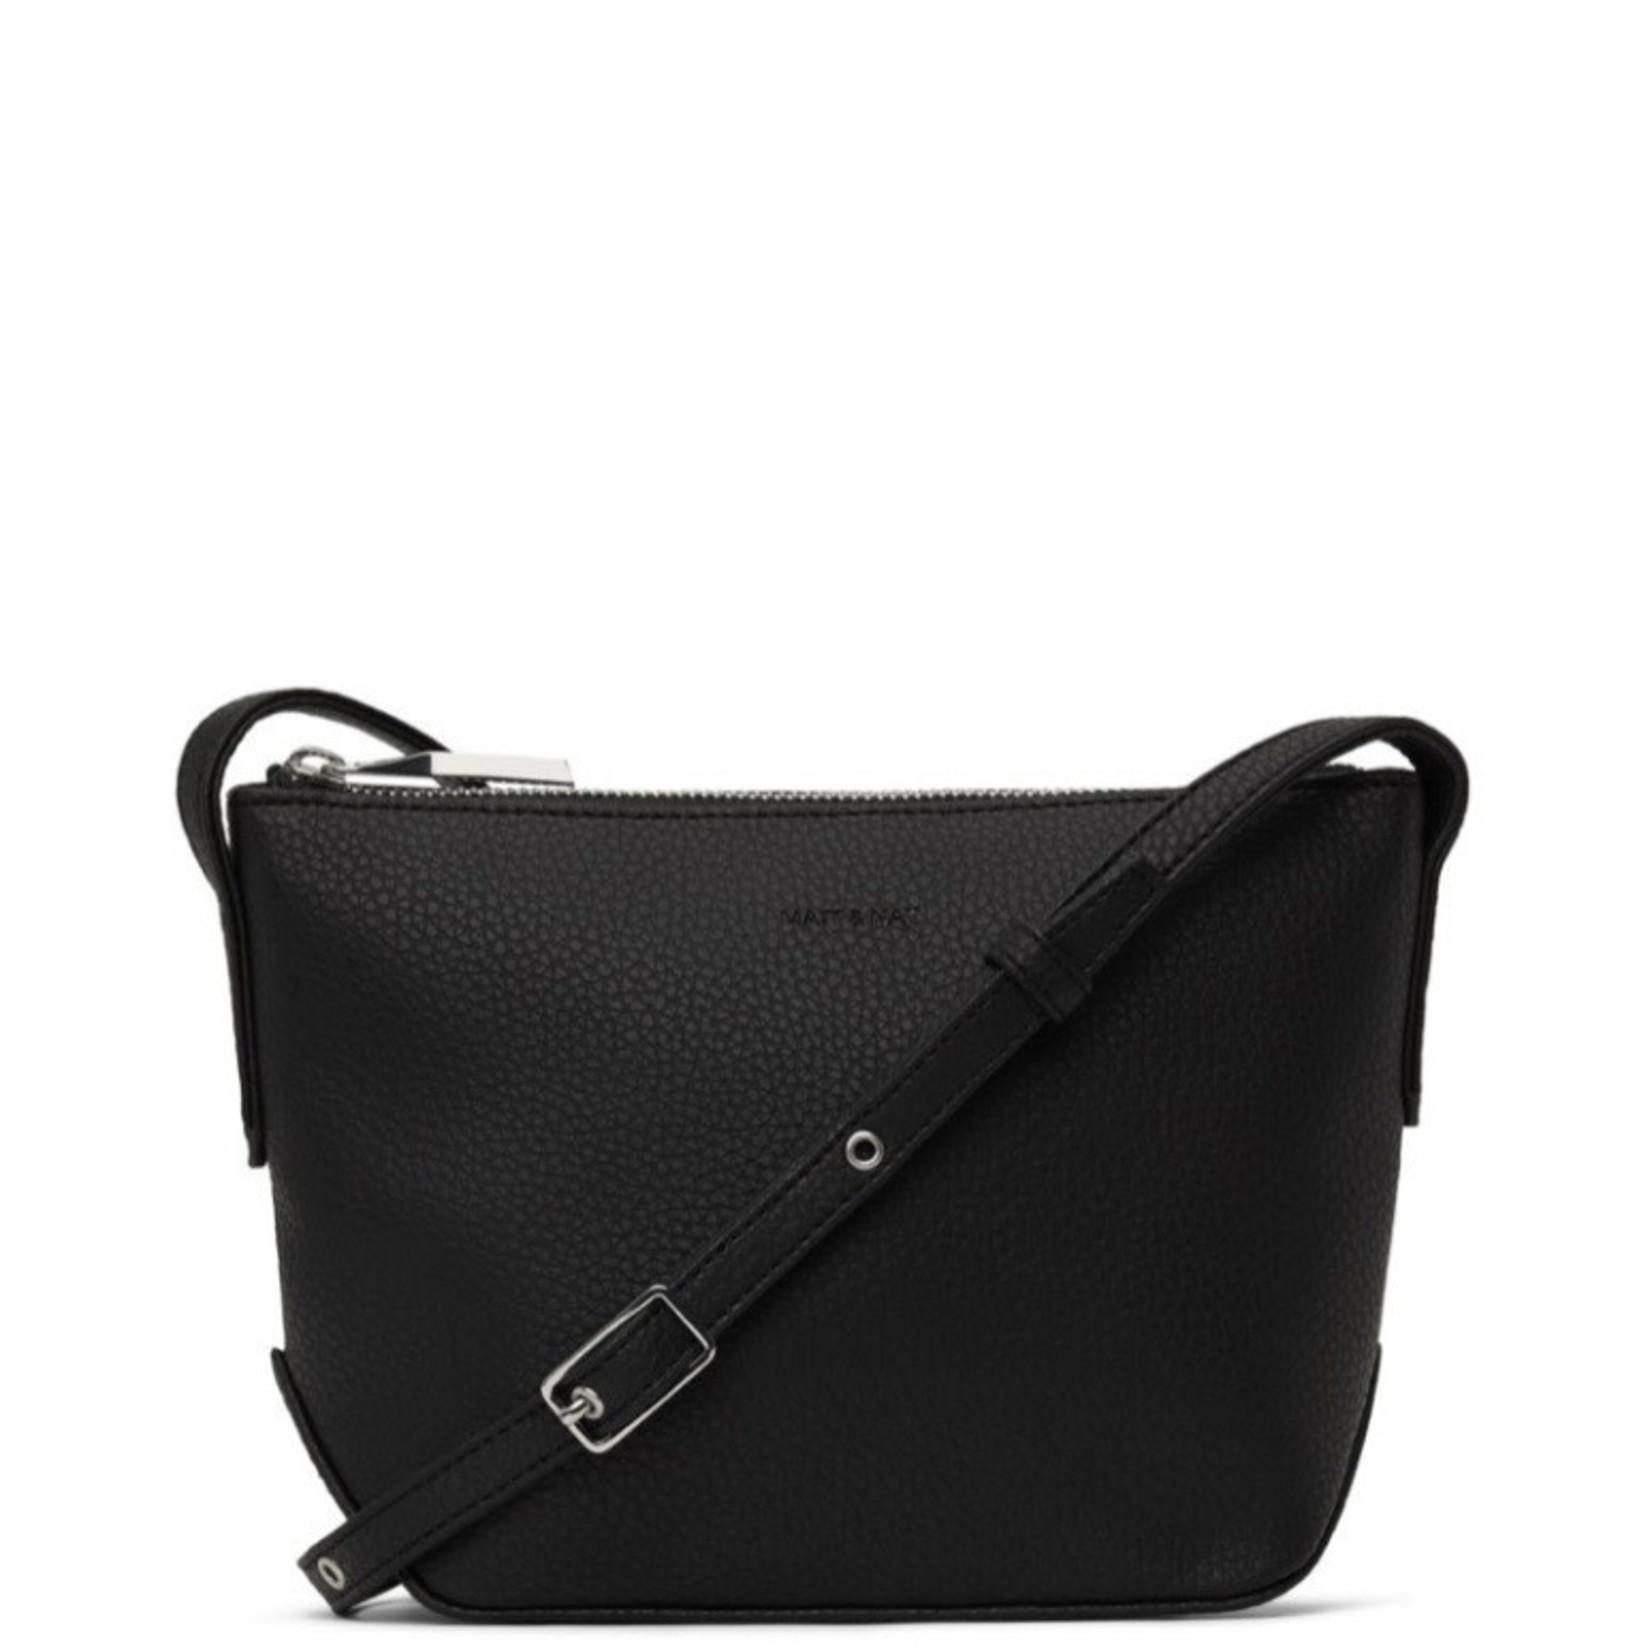 matt & nat Sam Purity Crossbody Bag Black